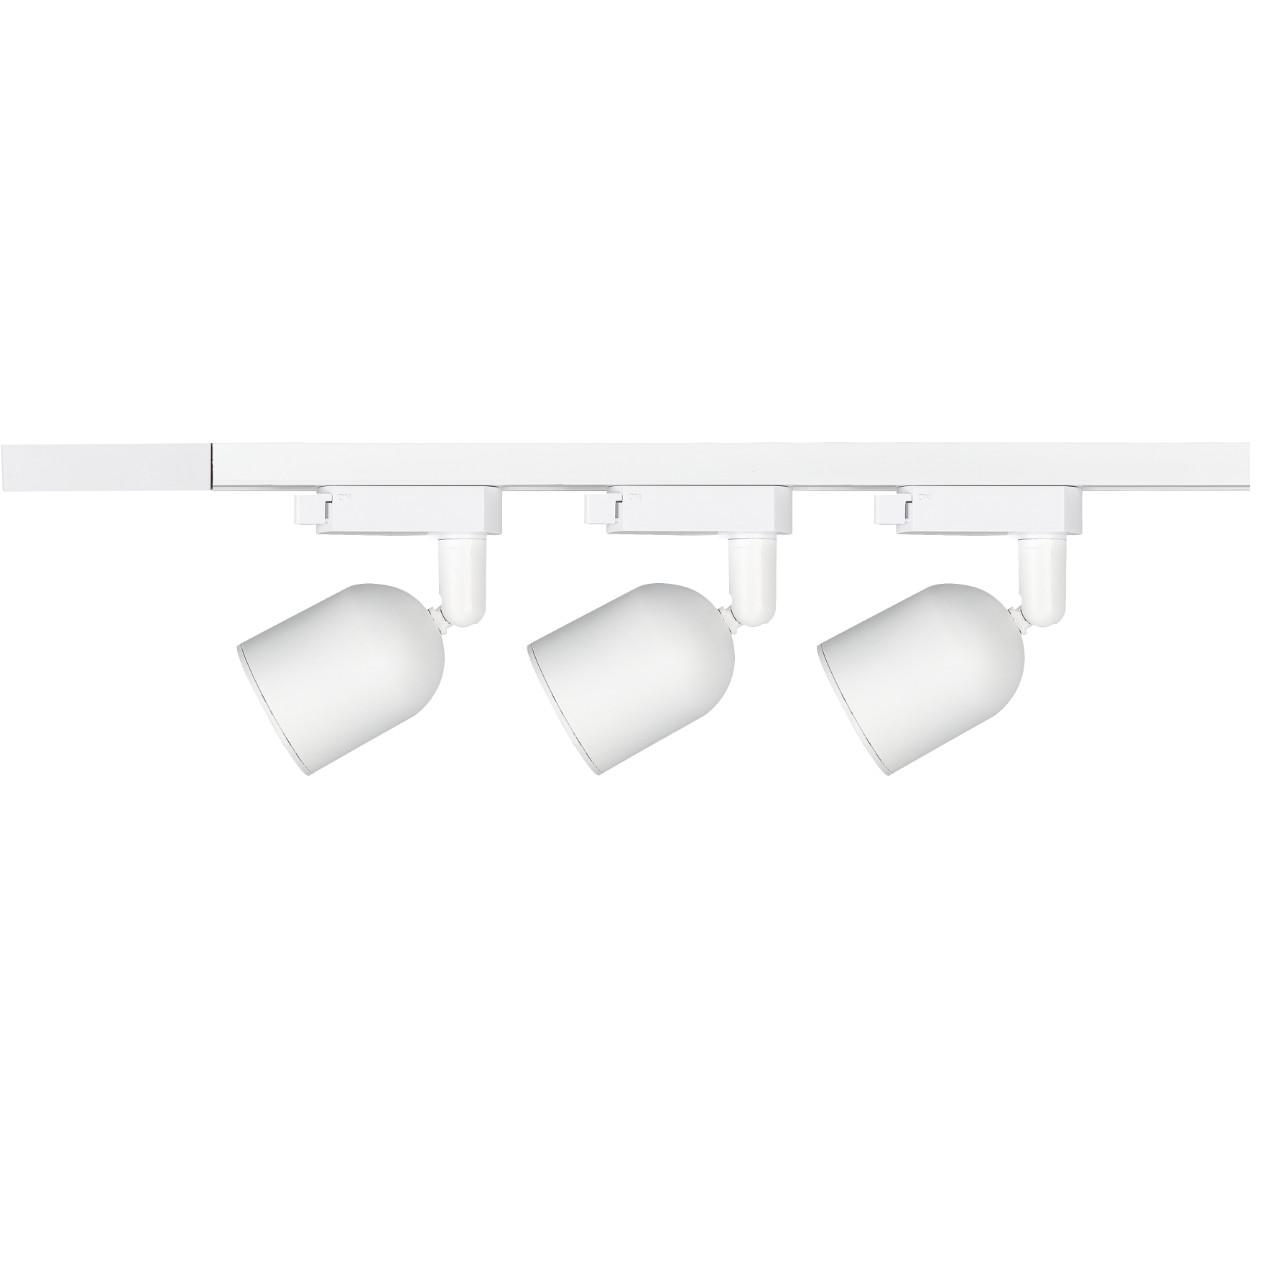 Kit Trilho Spot LED de Sobrepor com 3 Lampadas Branco 7W 110-240V Luz Branca - Avant